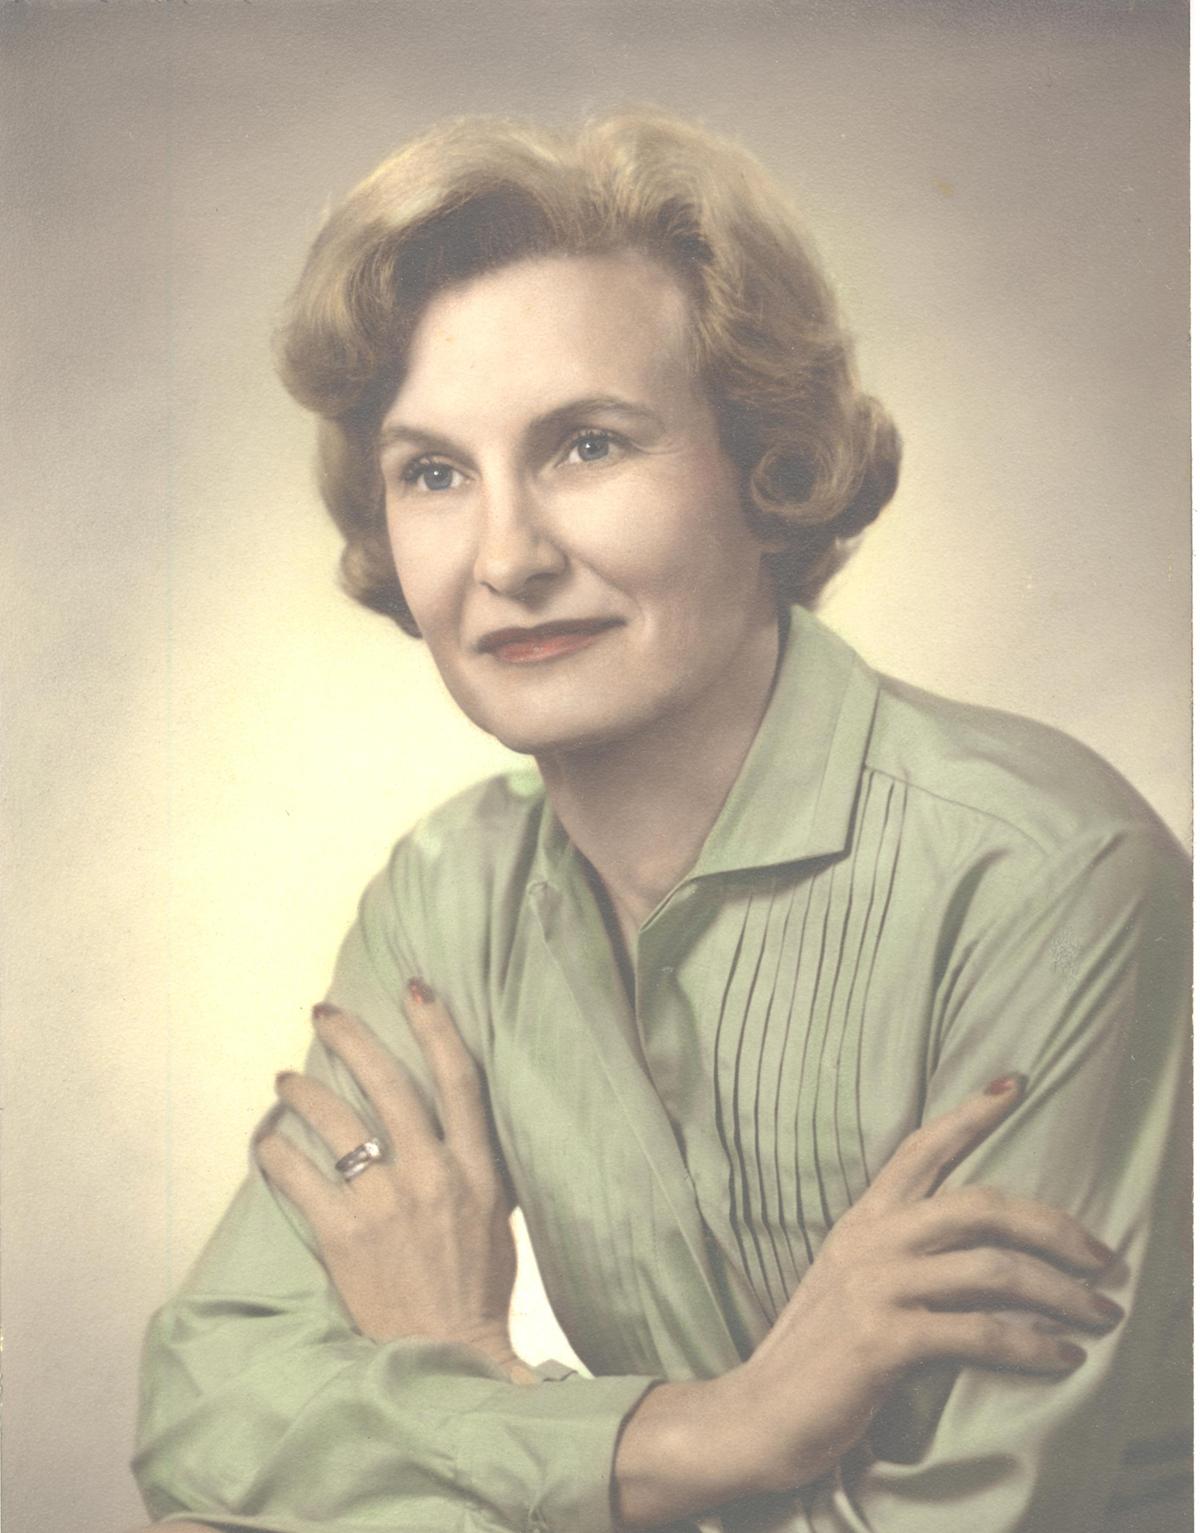 Wilma Dykeman Legacy